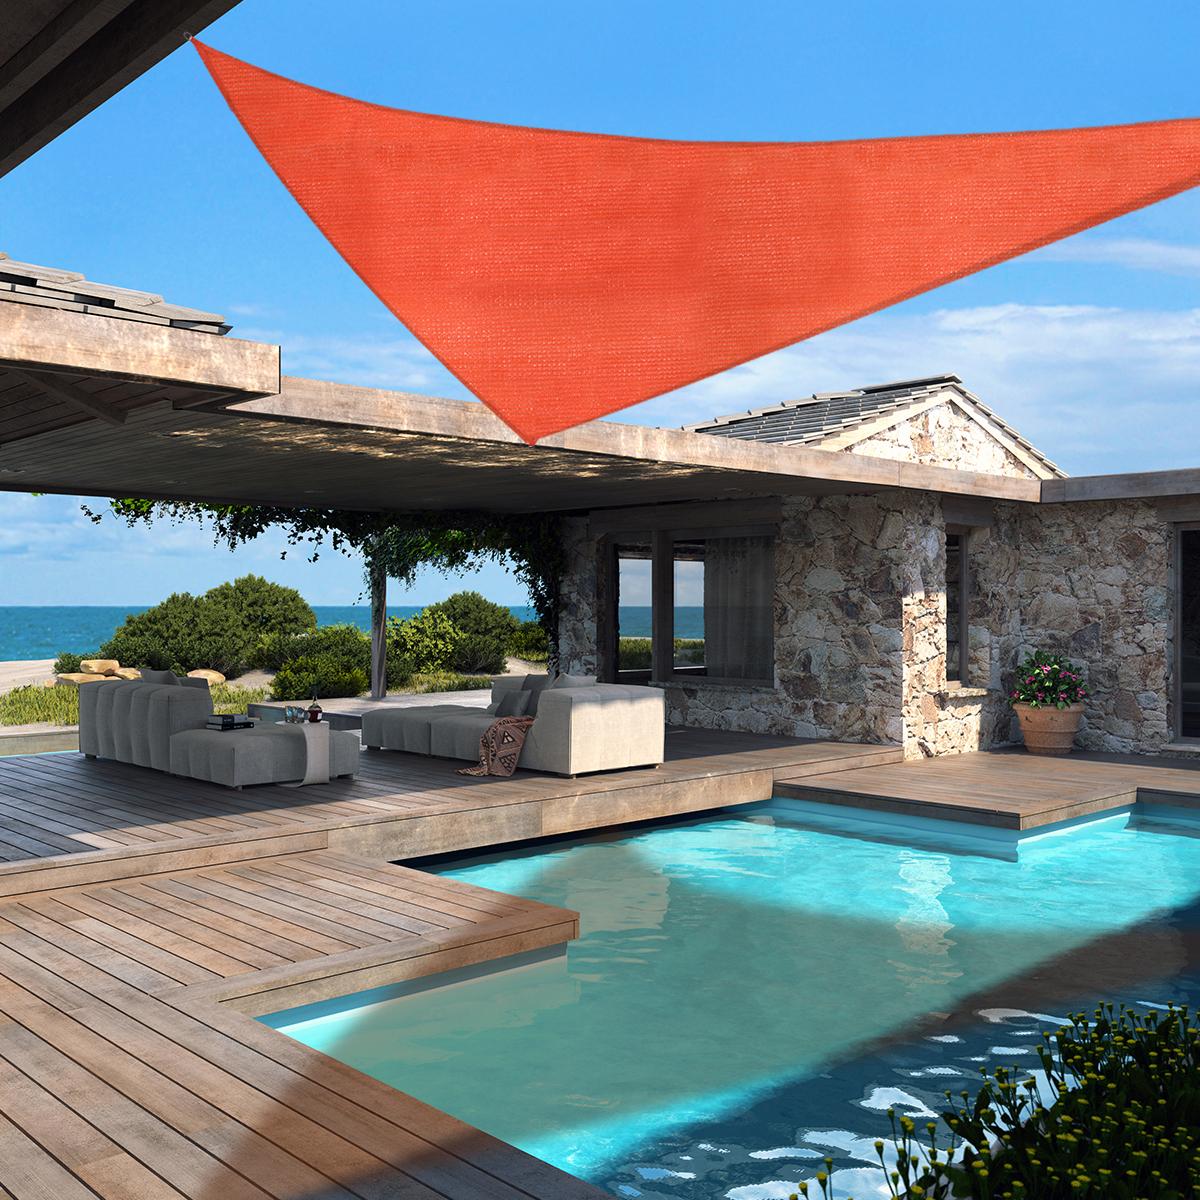 16.5 Ft Triangle Sun Shade Sail Fabric Outdoor Patio Pool ...